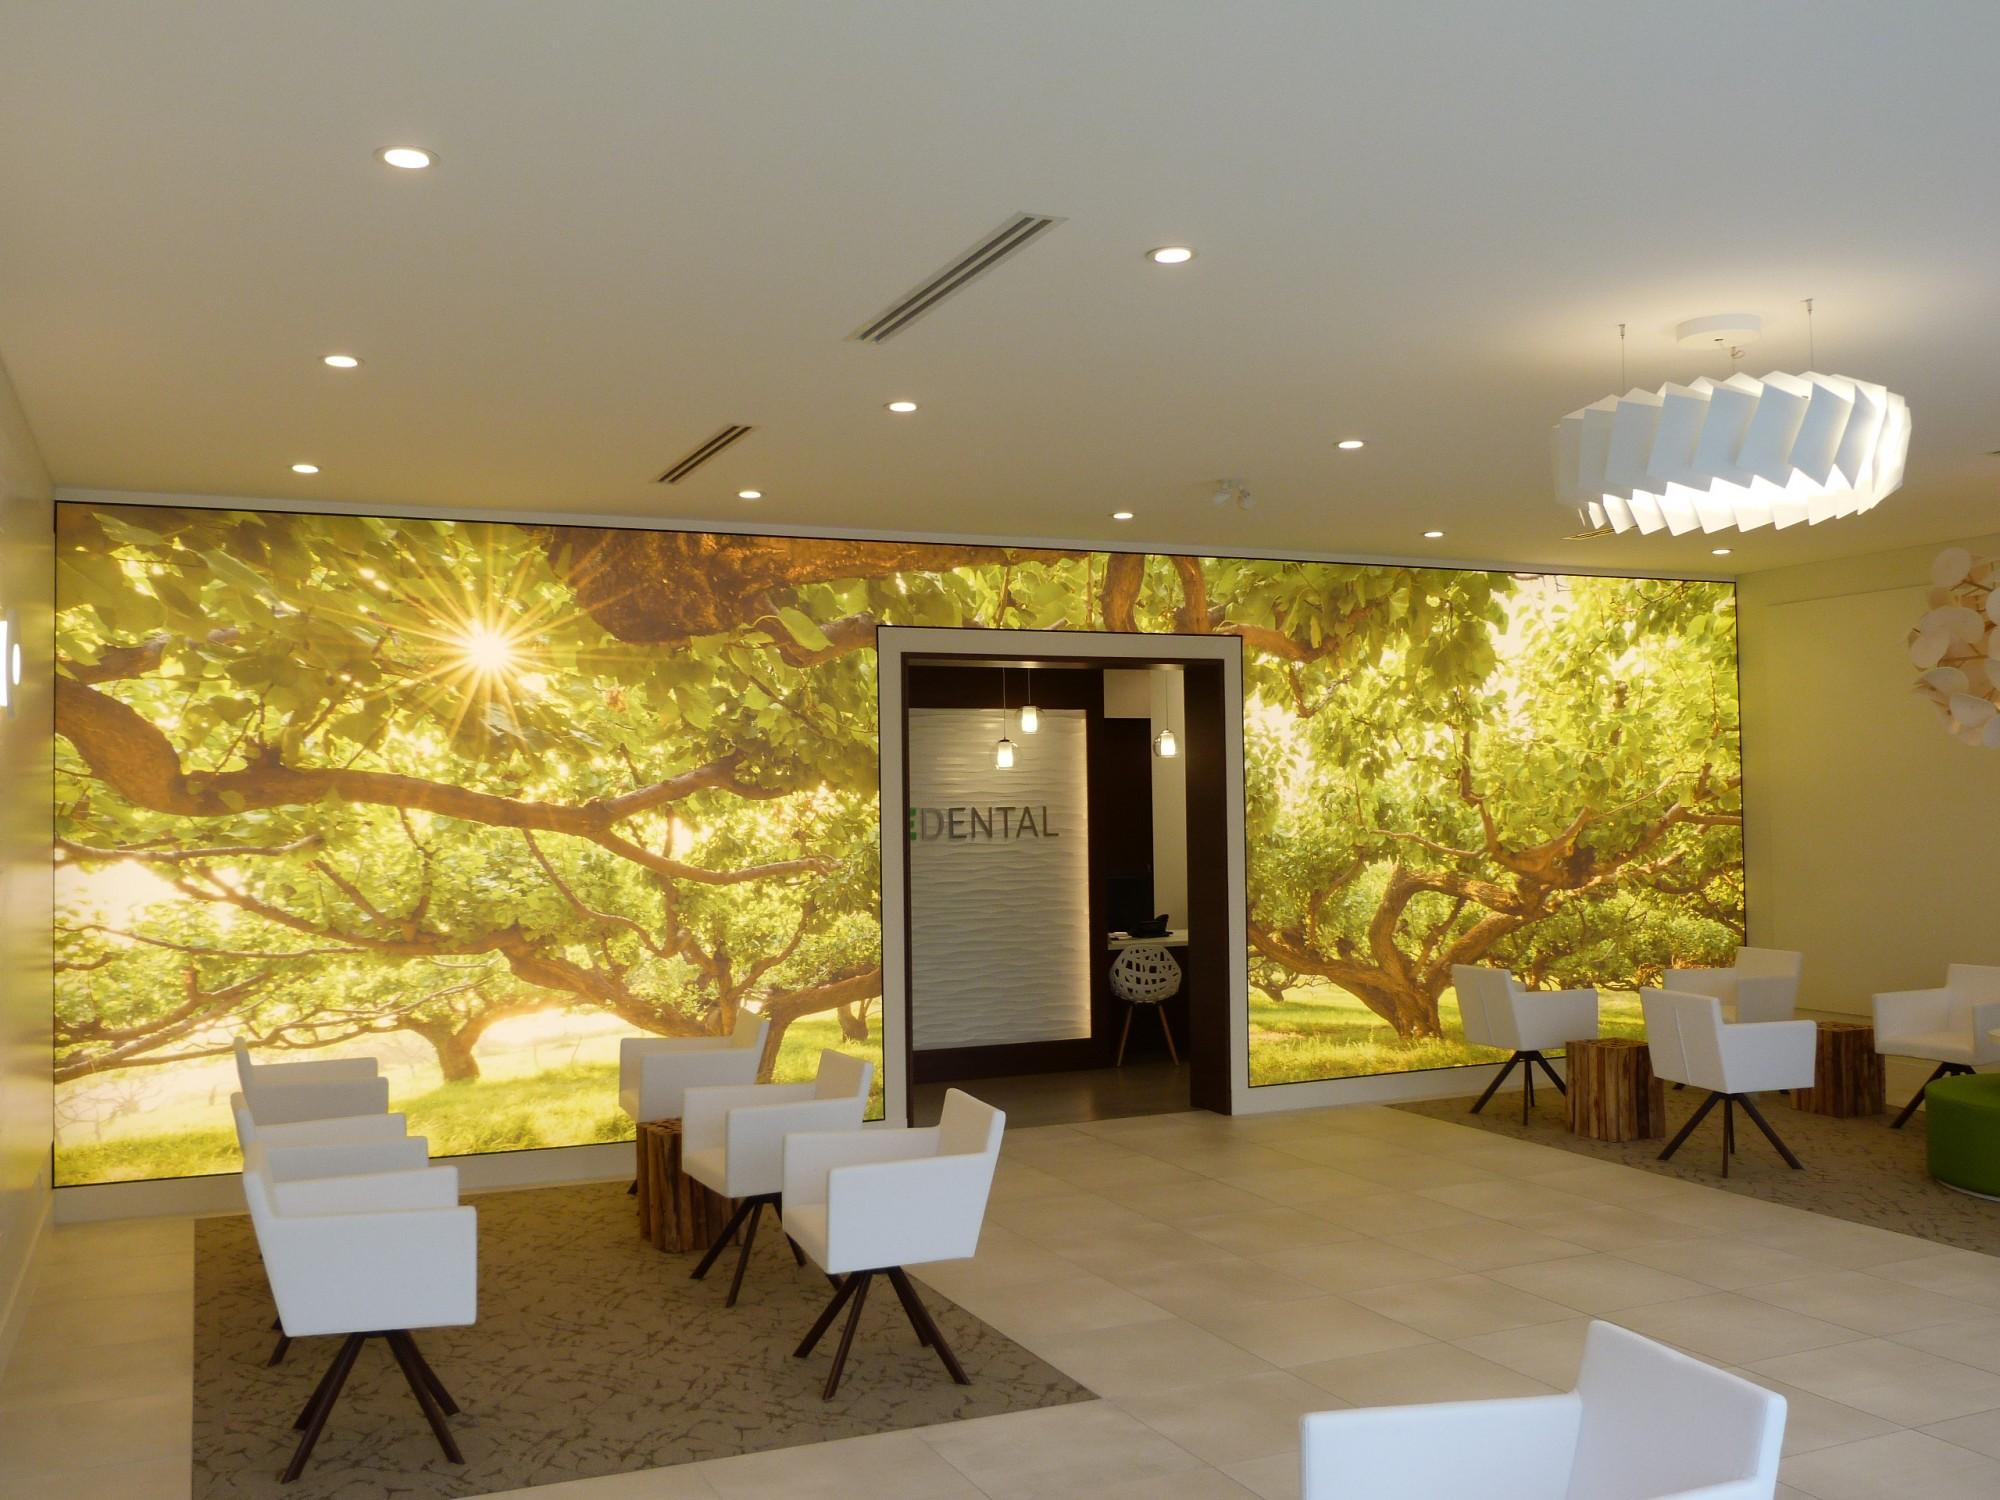 Contemporary Illuminated Wall Art Illustration - Art & Wall Decor ...